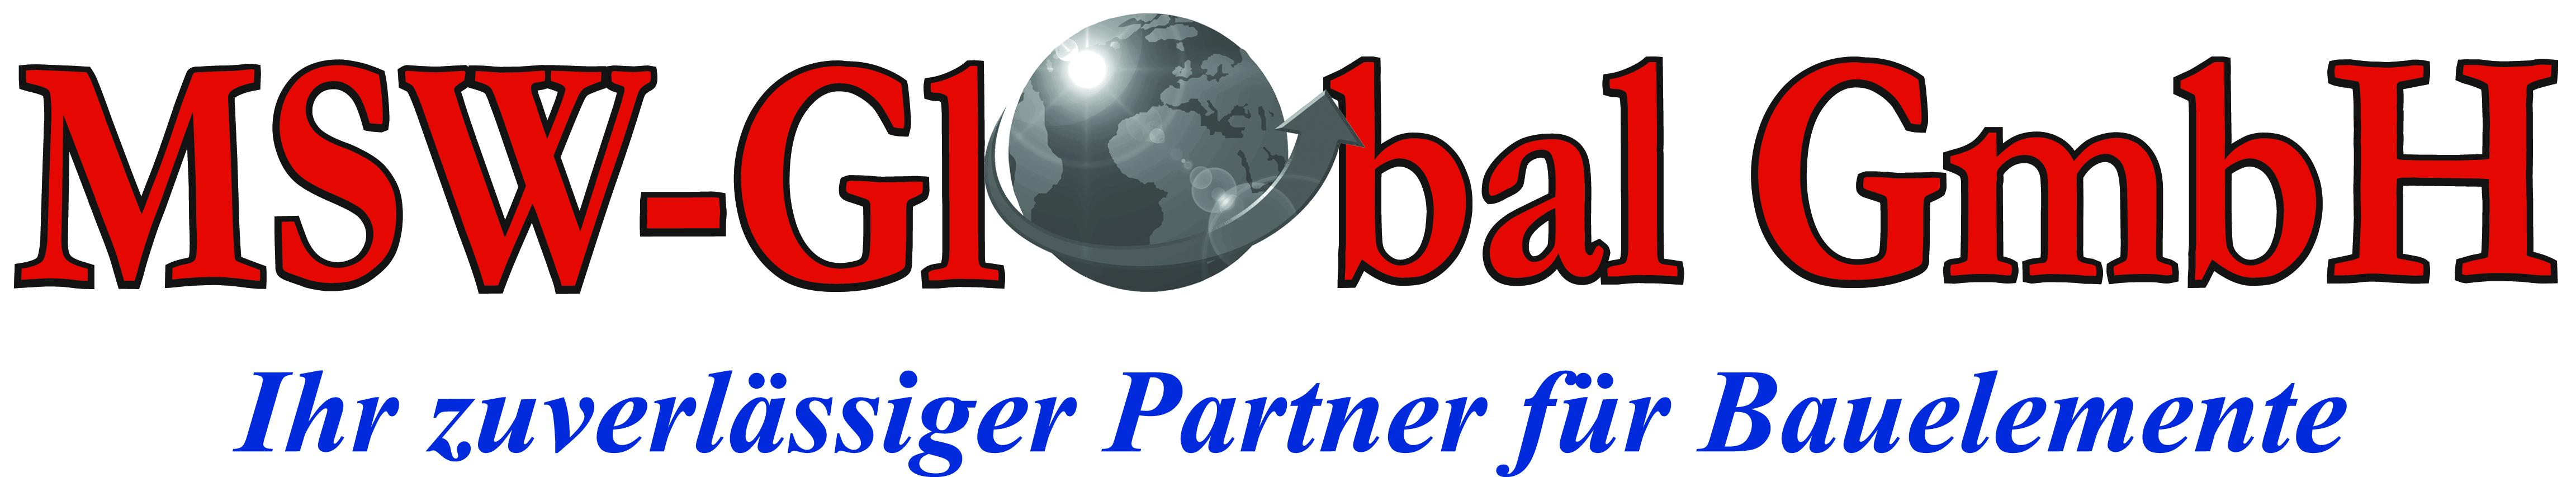 MSW-Global GmbH